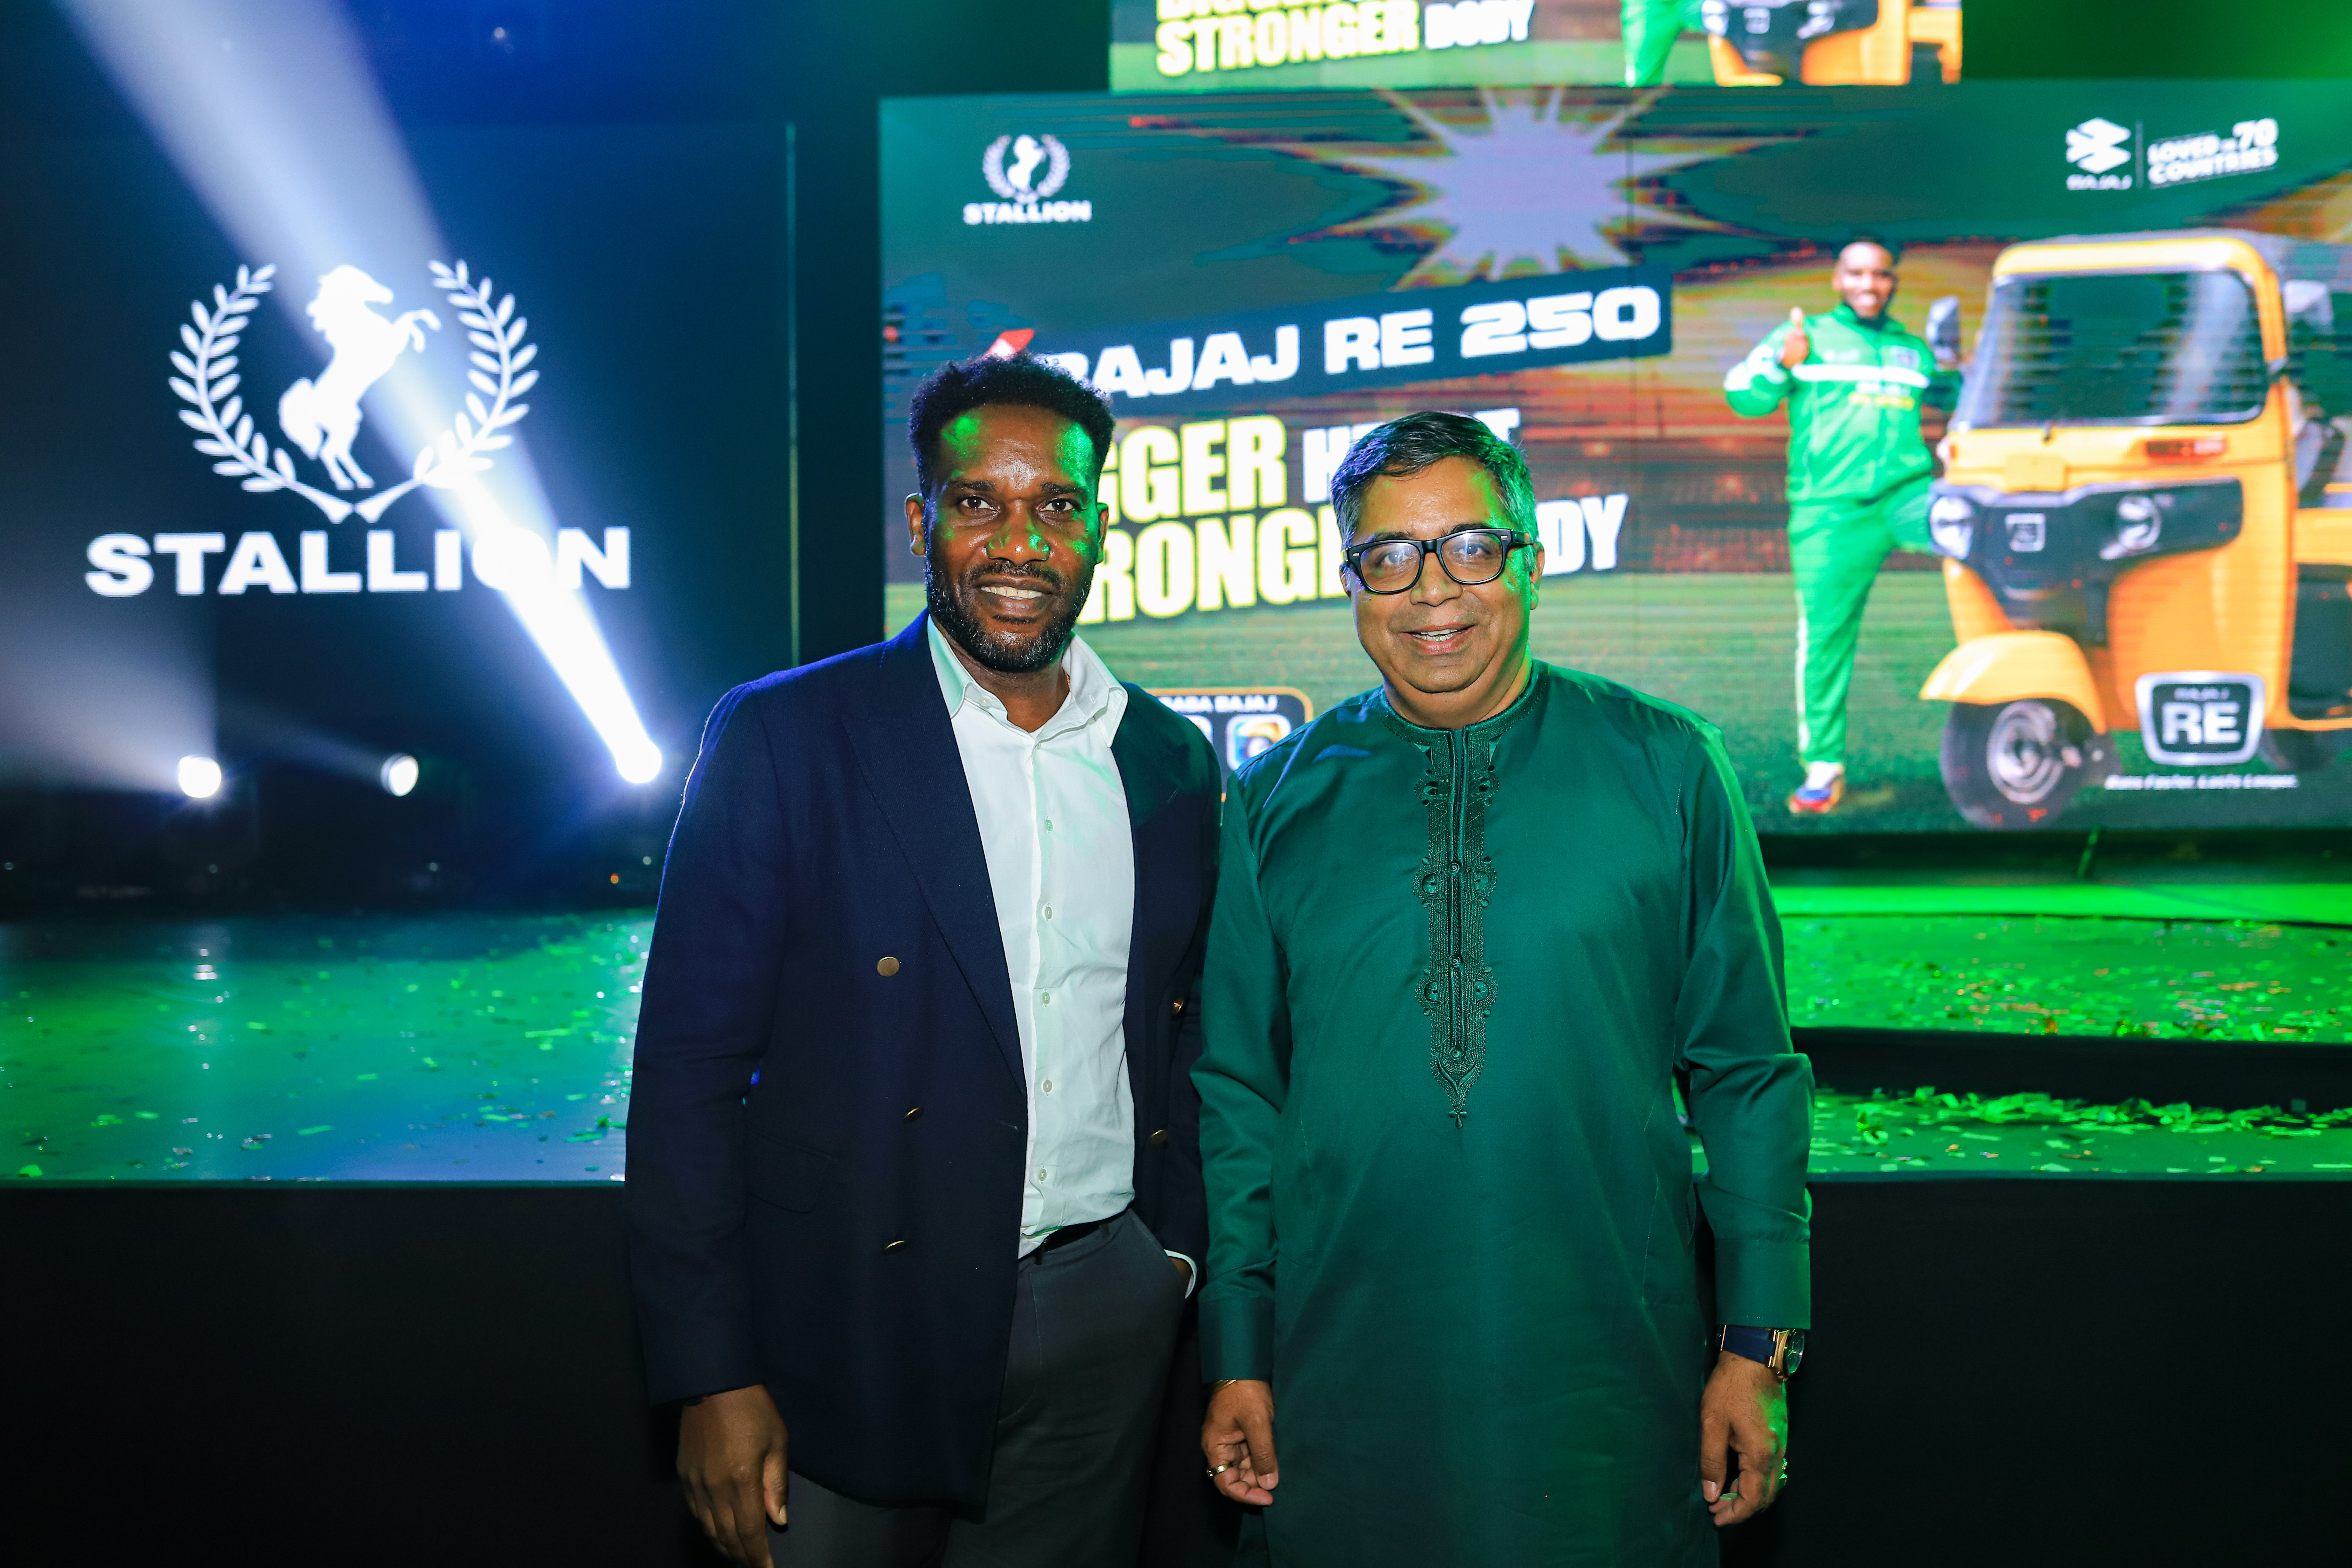 Bajaj Auto Launches RE 250 Superkeke in Nigeria lindaikejisblog2